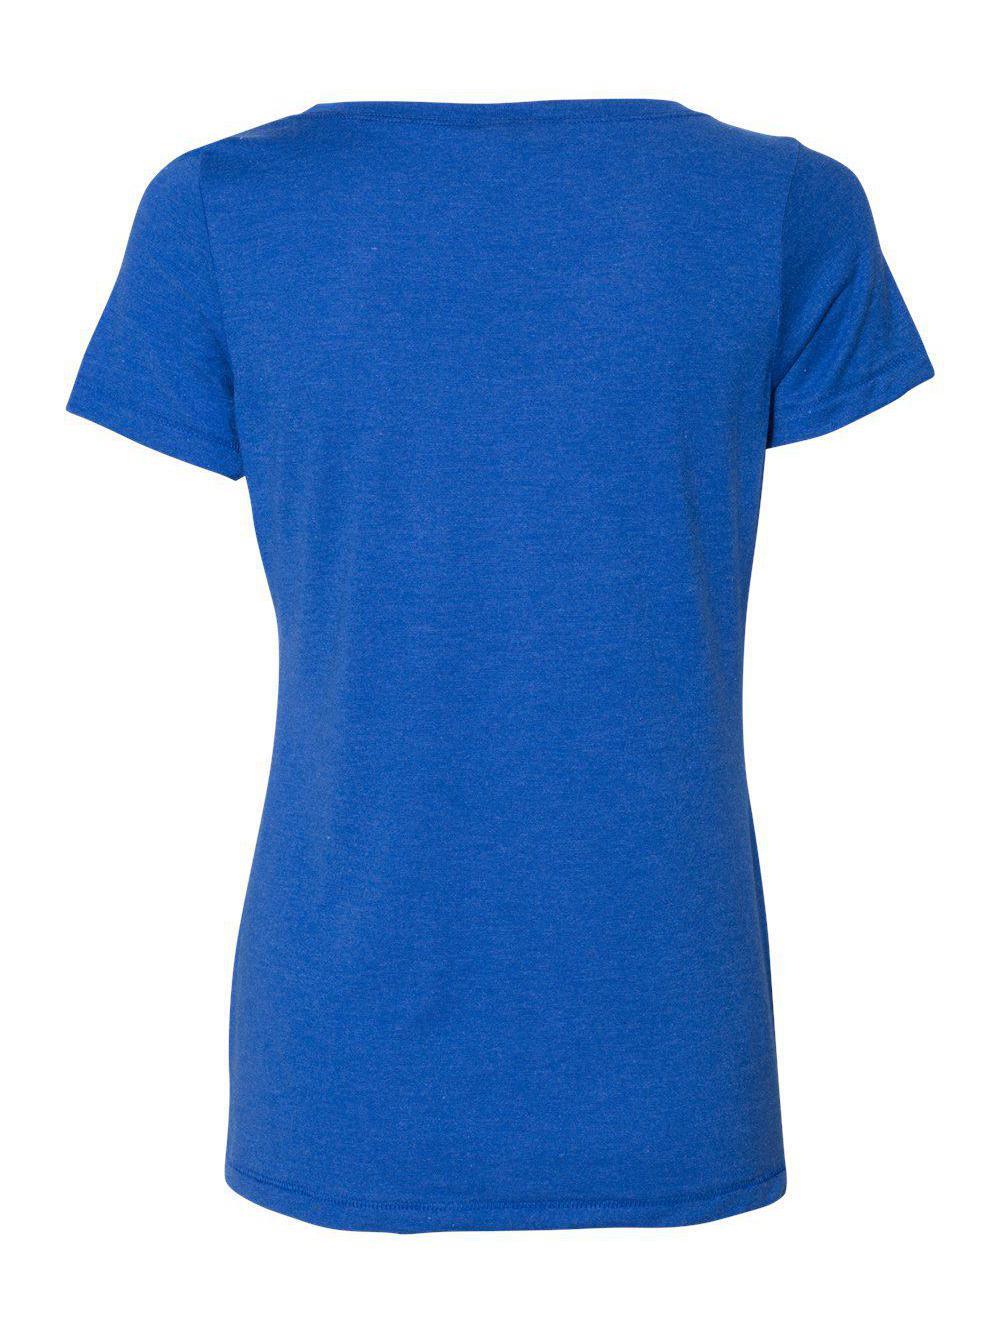 Hanes-Women-039-s-Modal-Triblend-T-Shirt-MO150 thumbnail 21